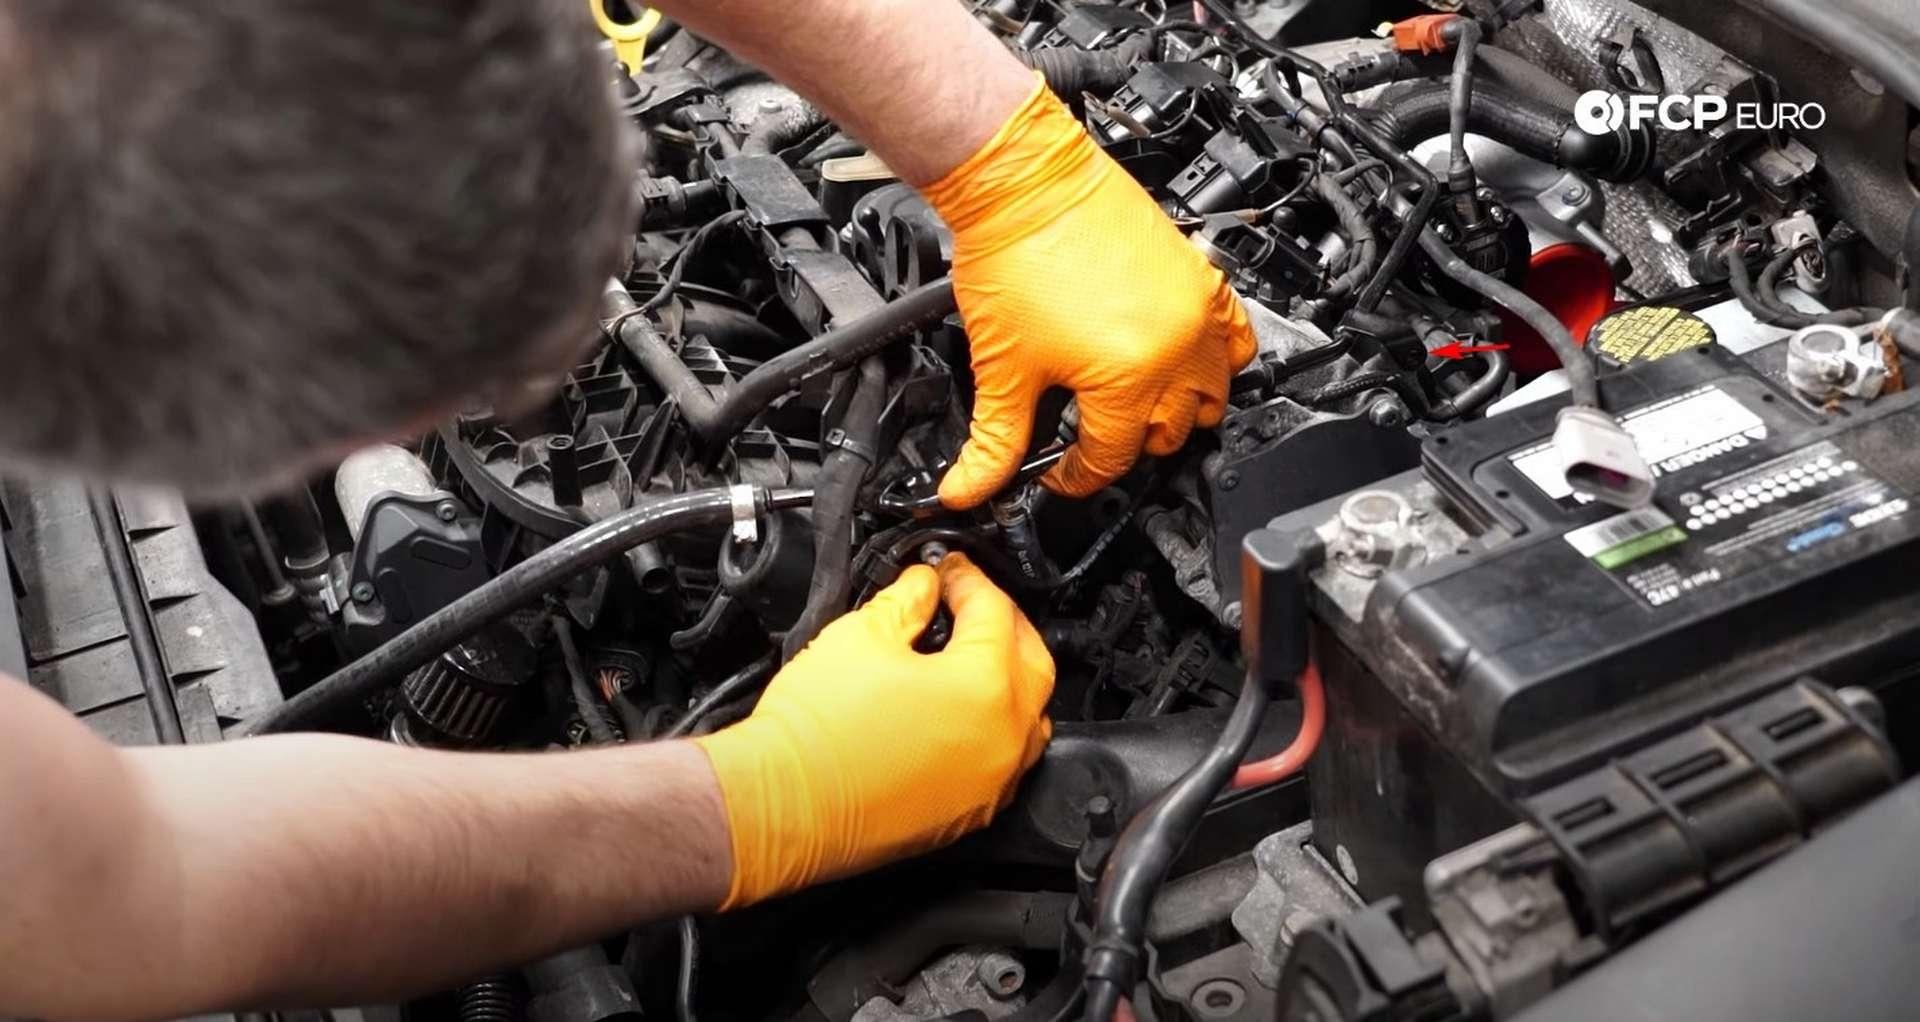 DIY MK7 VW GTI Turbocharger Upgrade coolant line bolt locations